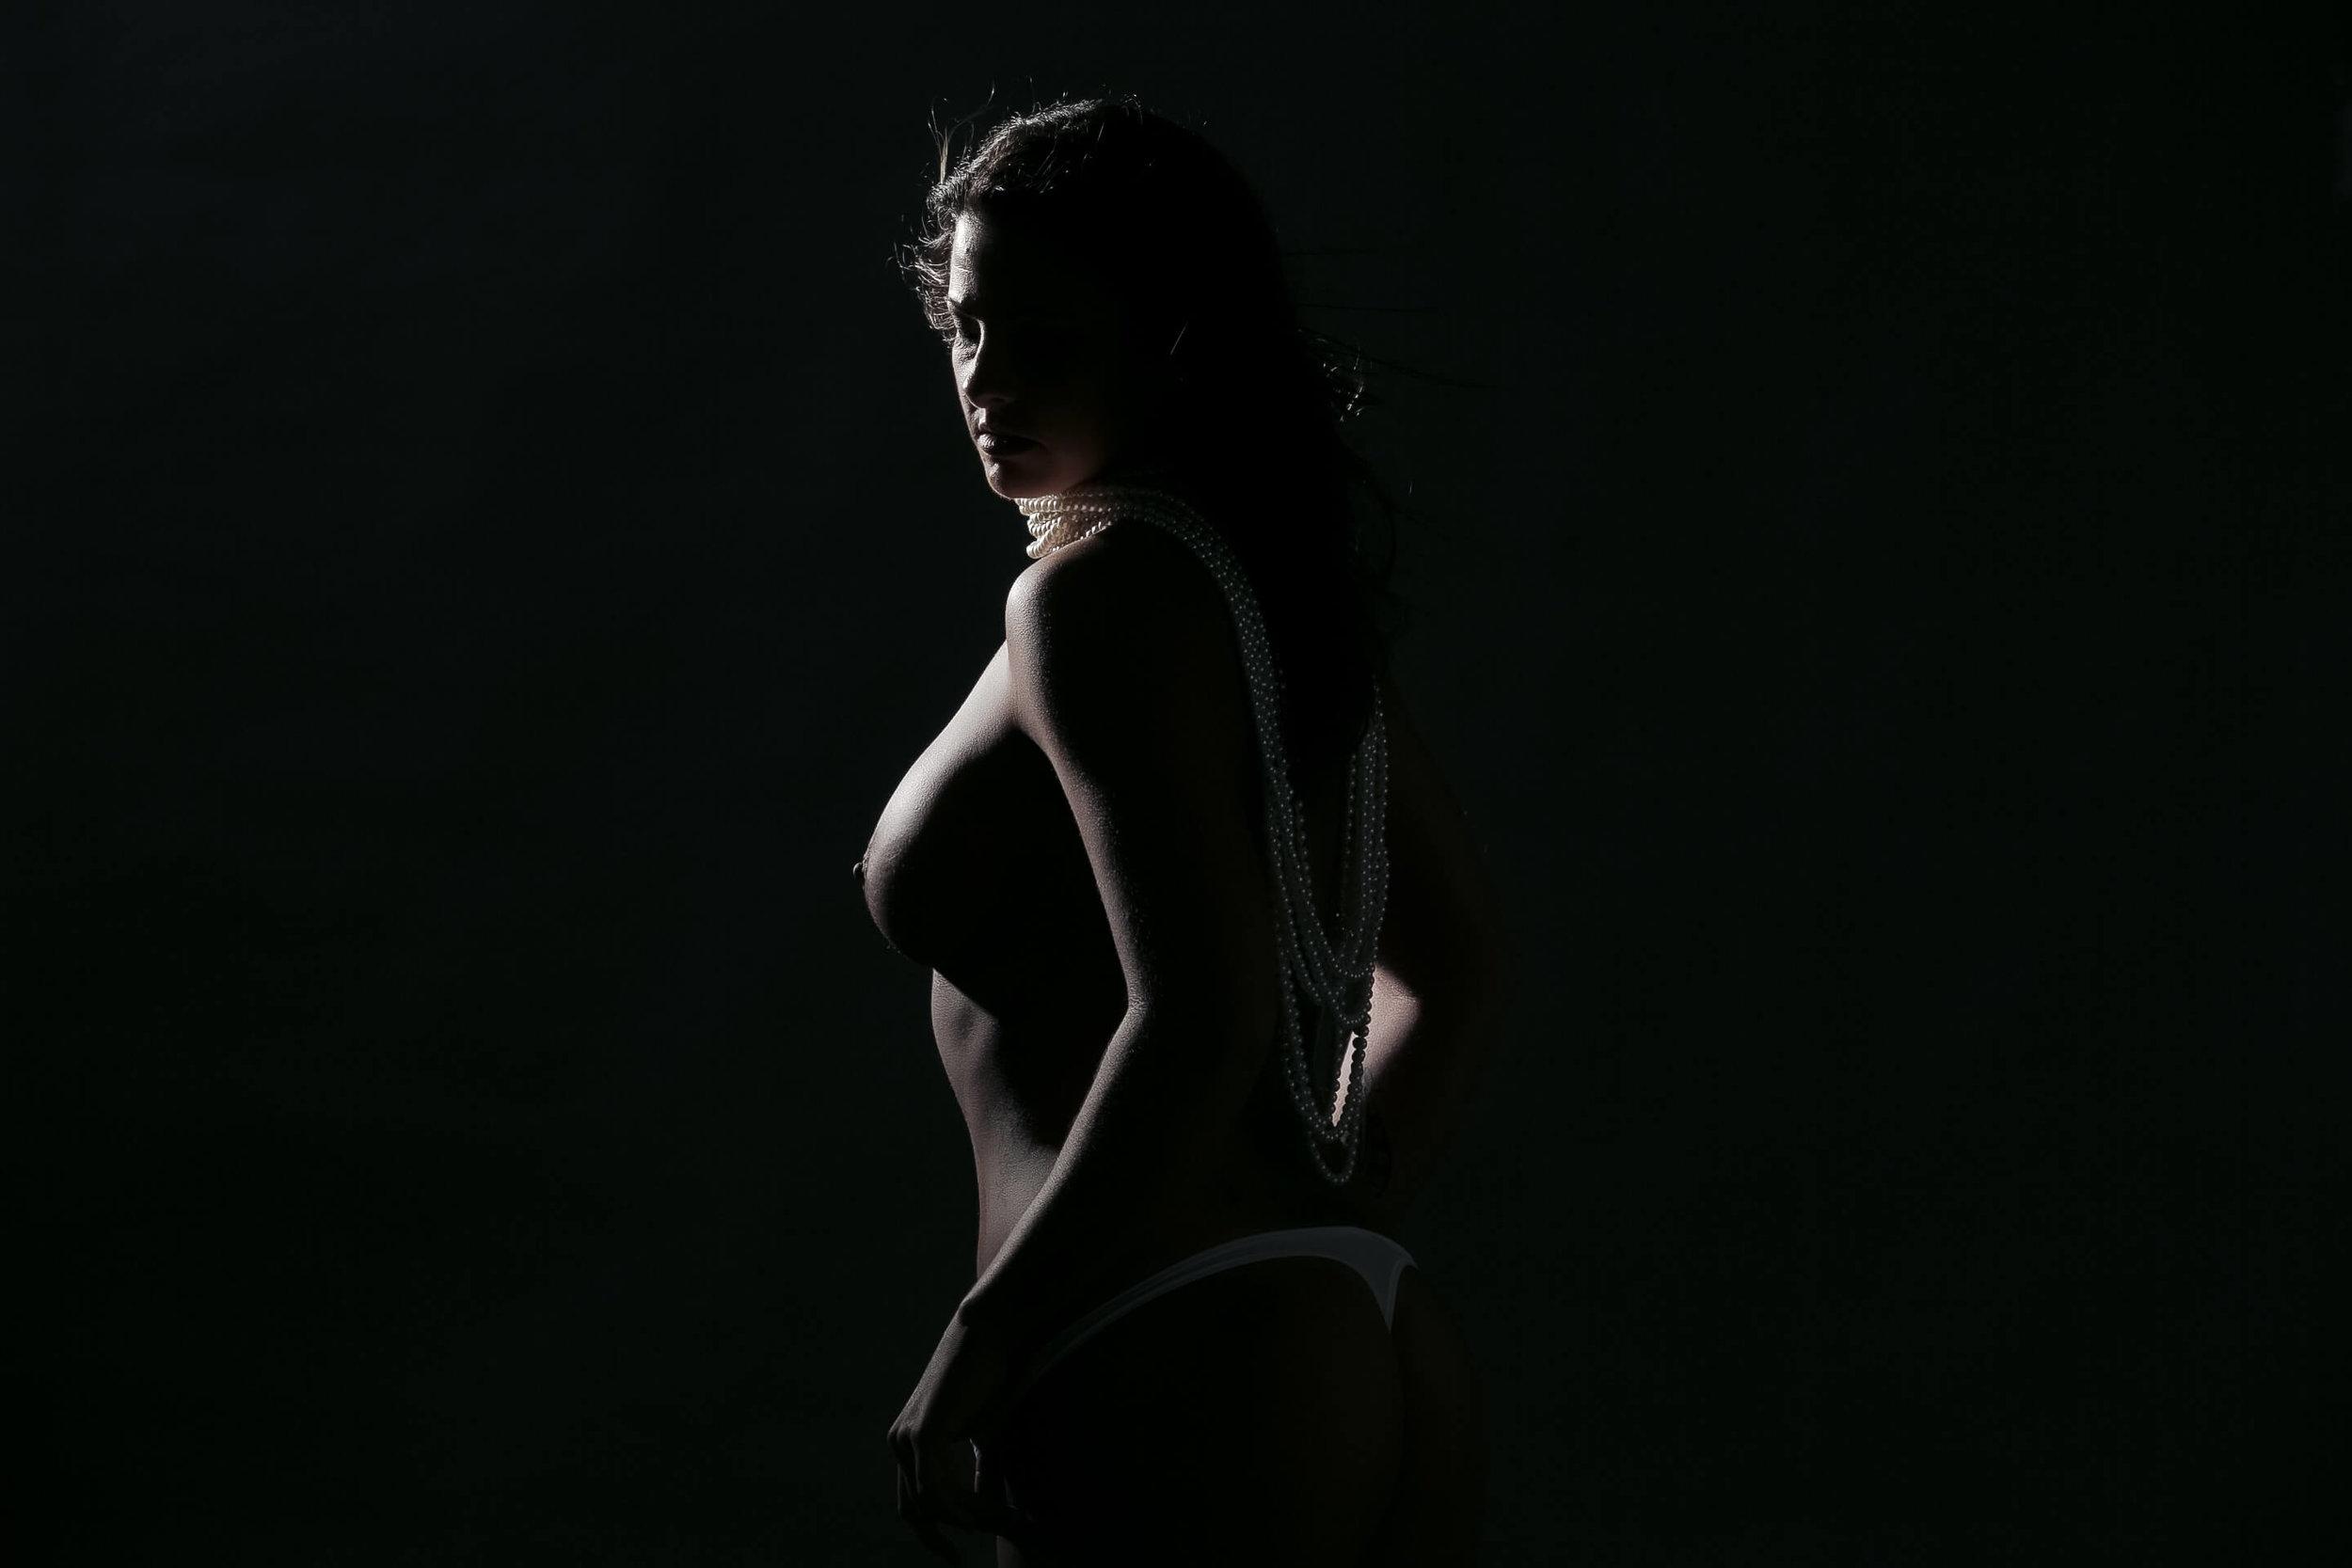 nude-goddess-01.jpg